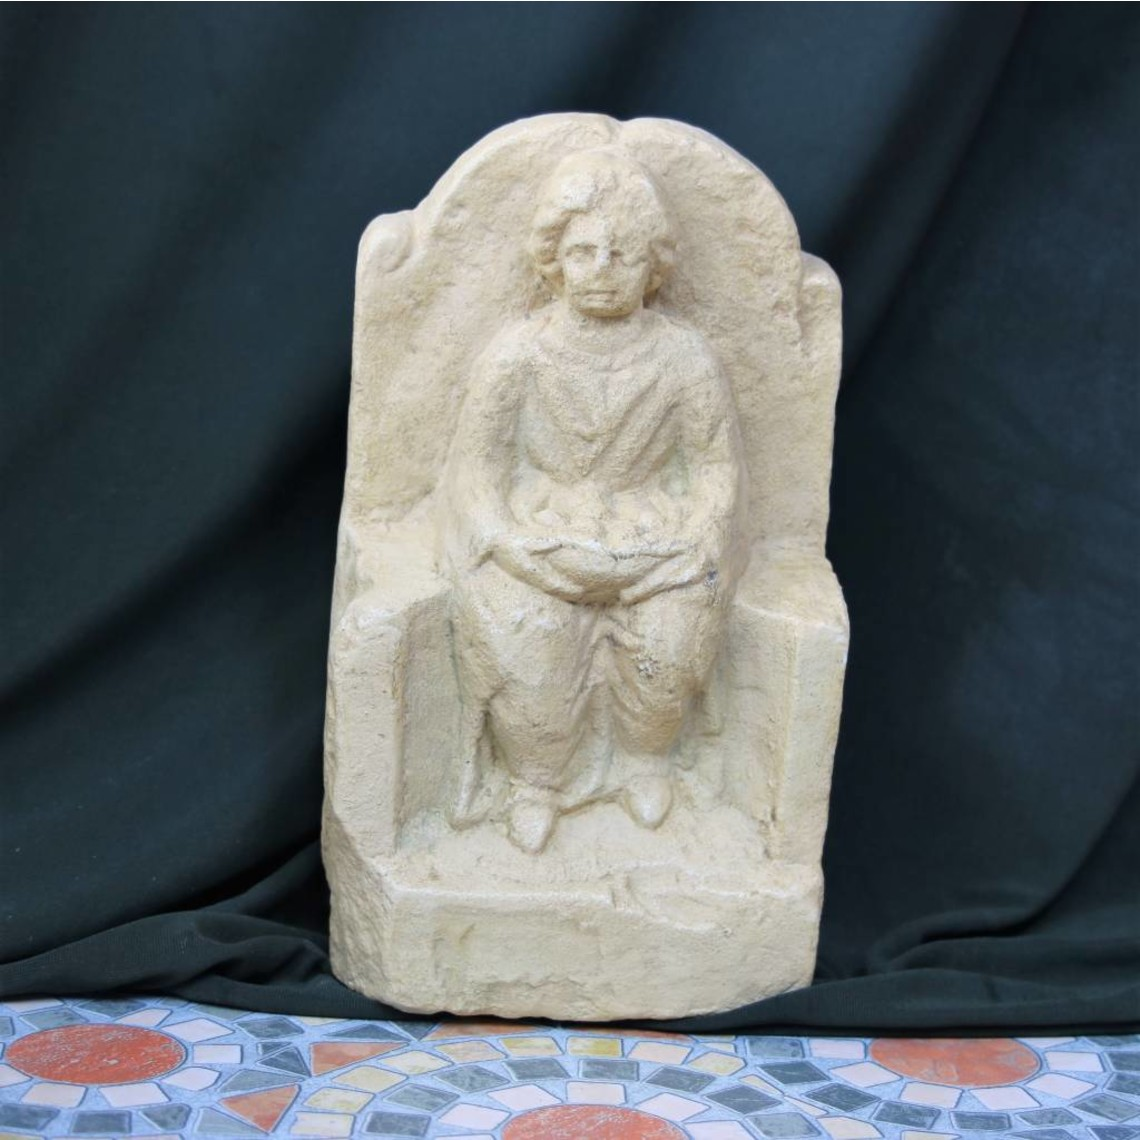 Relief de la dééesse Epona, Gaul